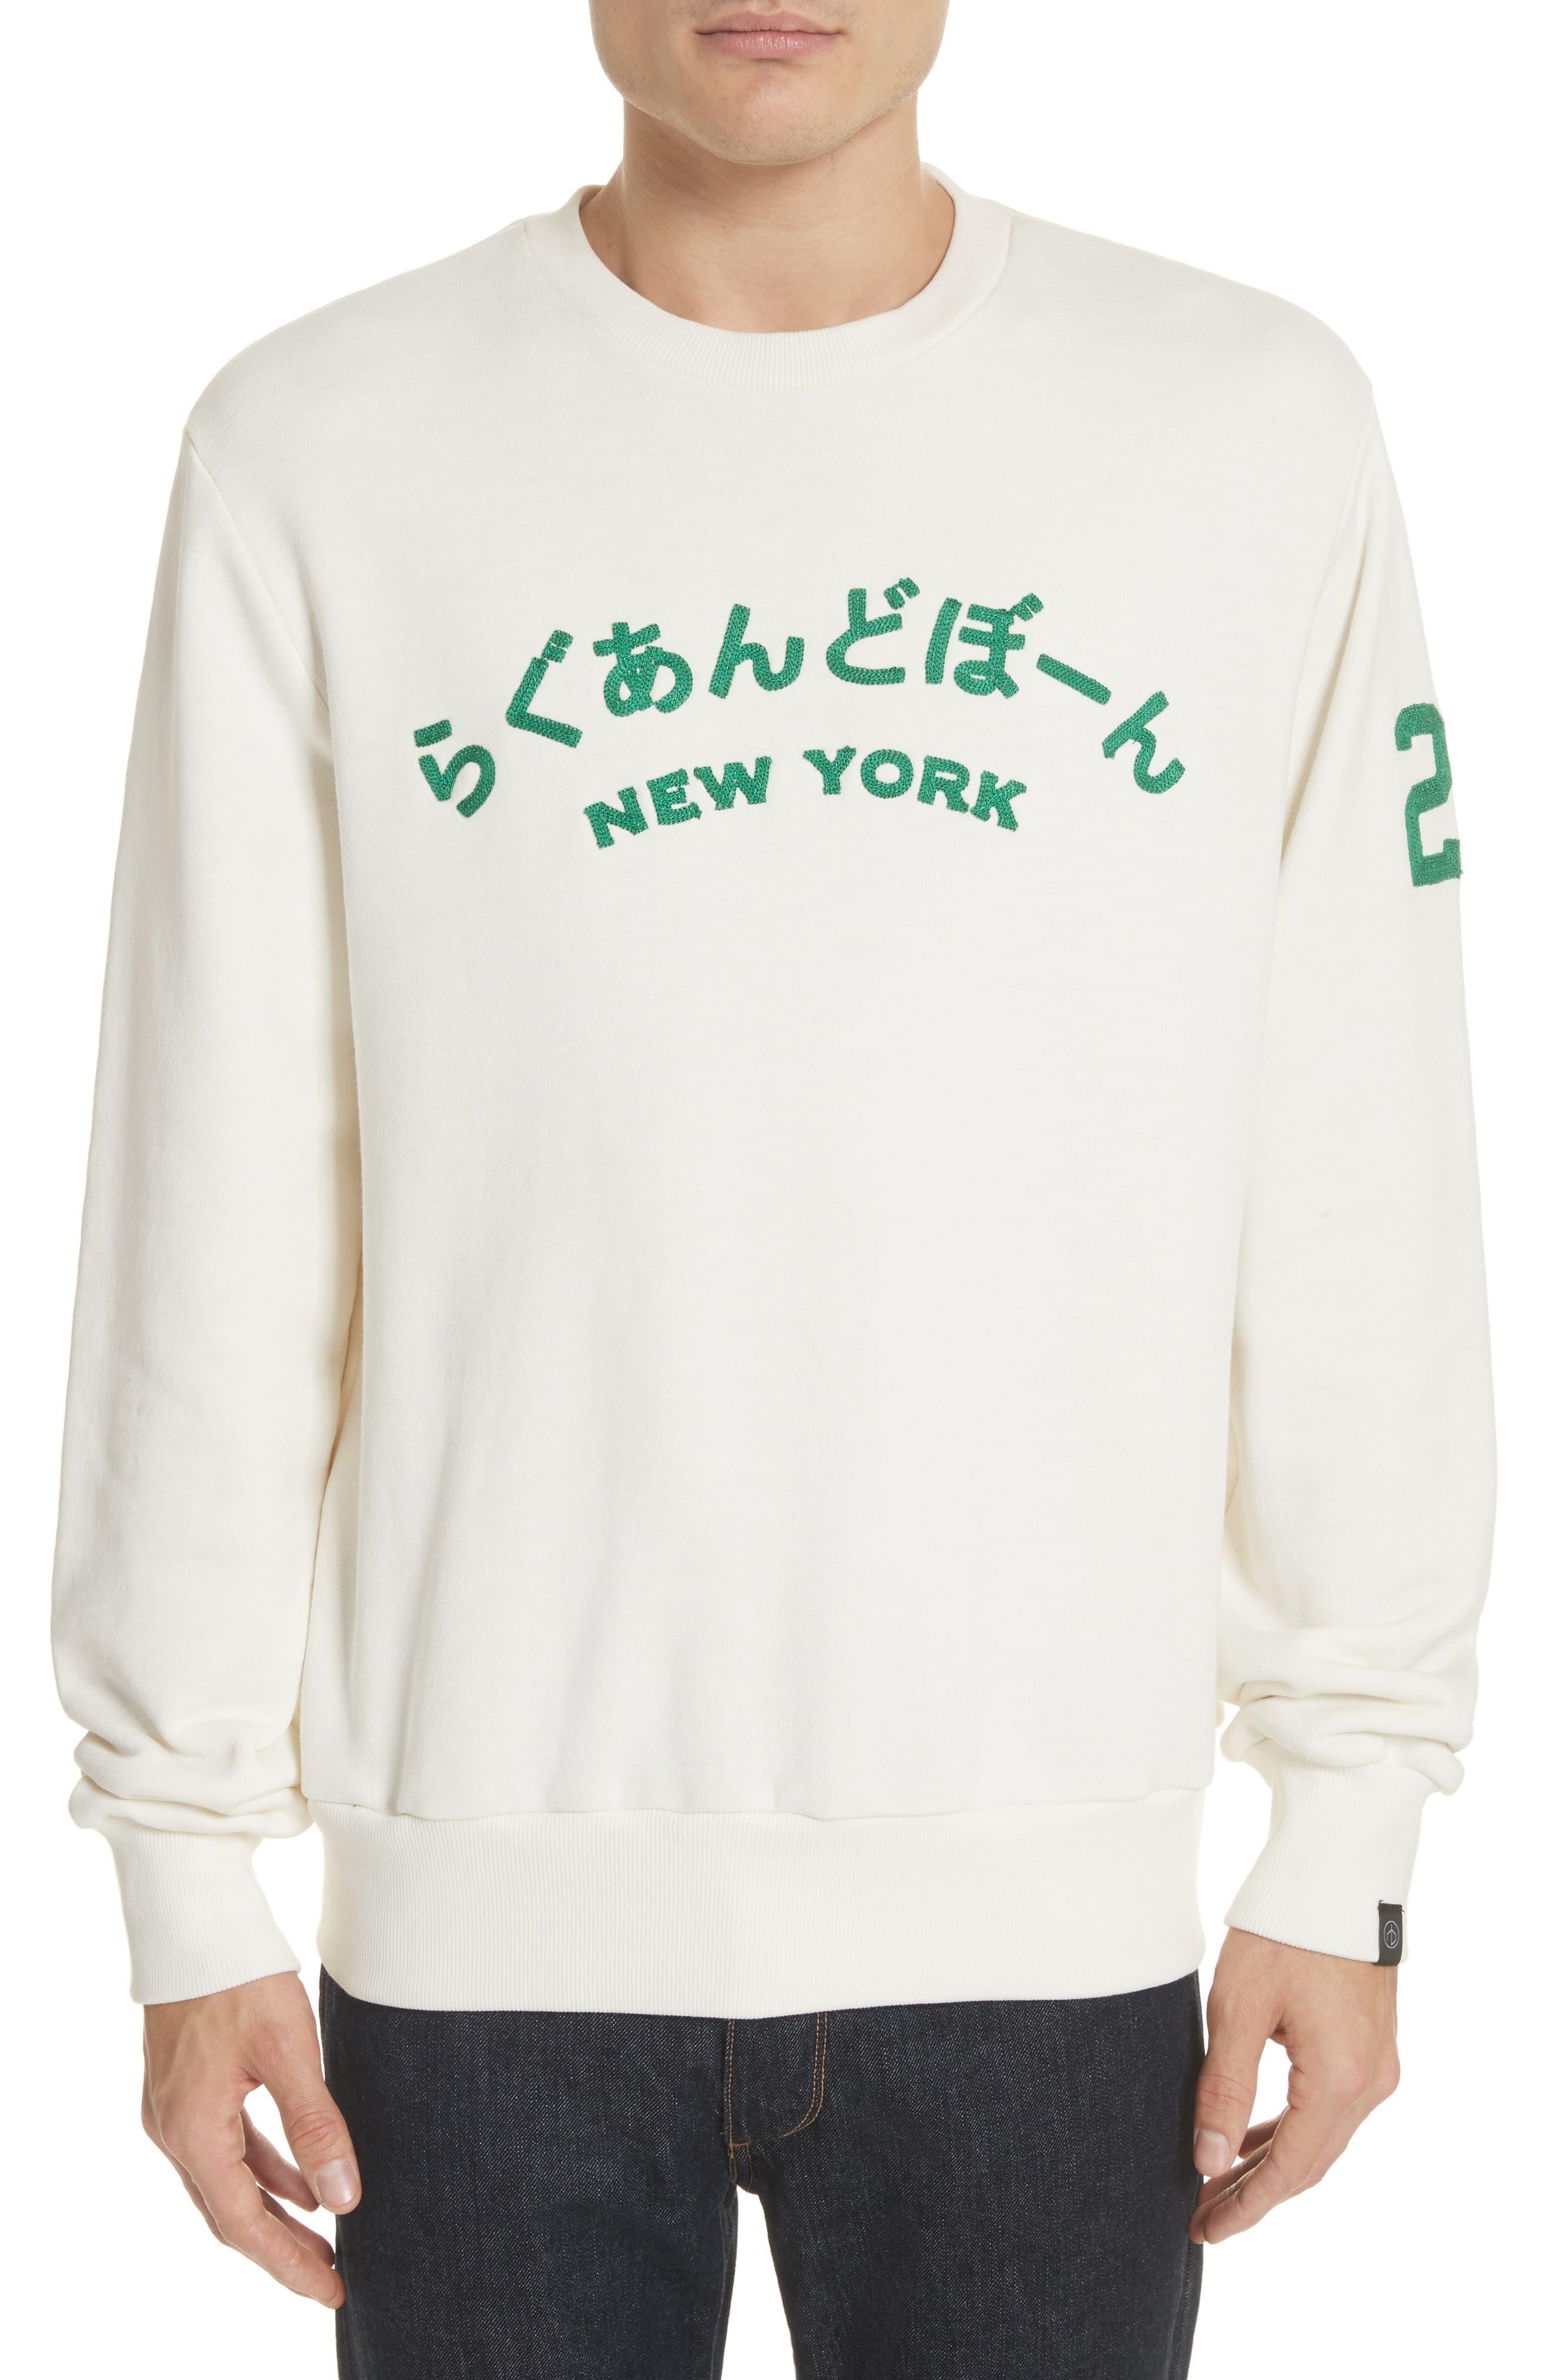 Japan Embroidered Crewneck Sweatshirt,                             Main thumbnail 1, color,                             900